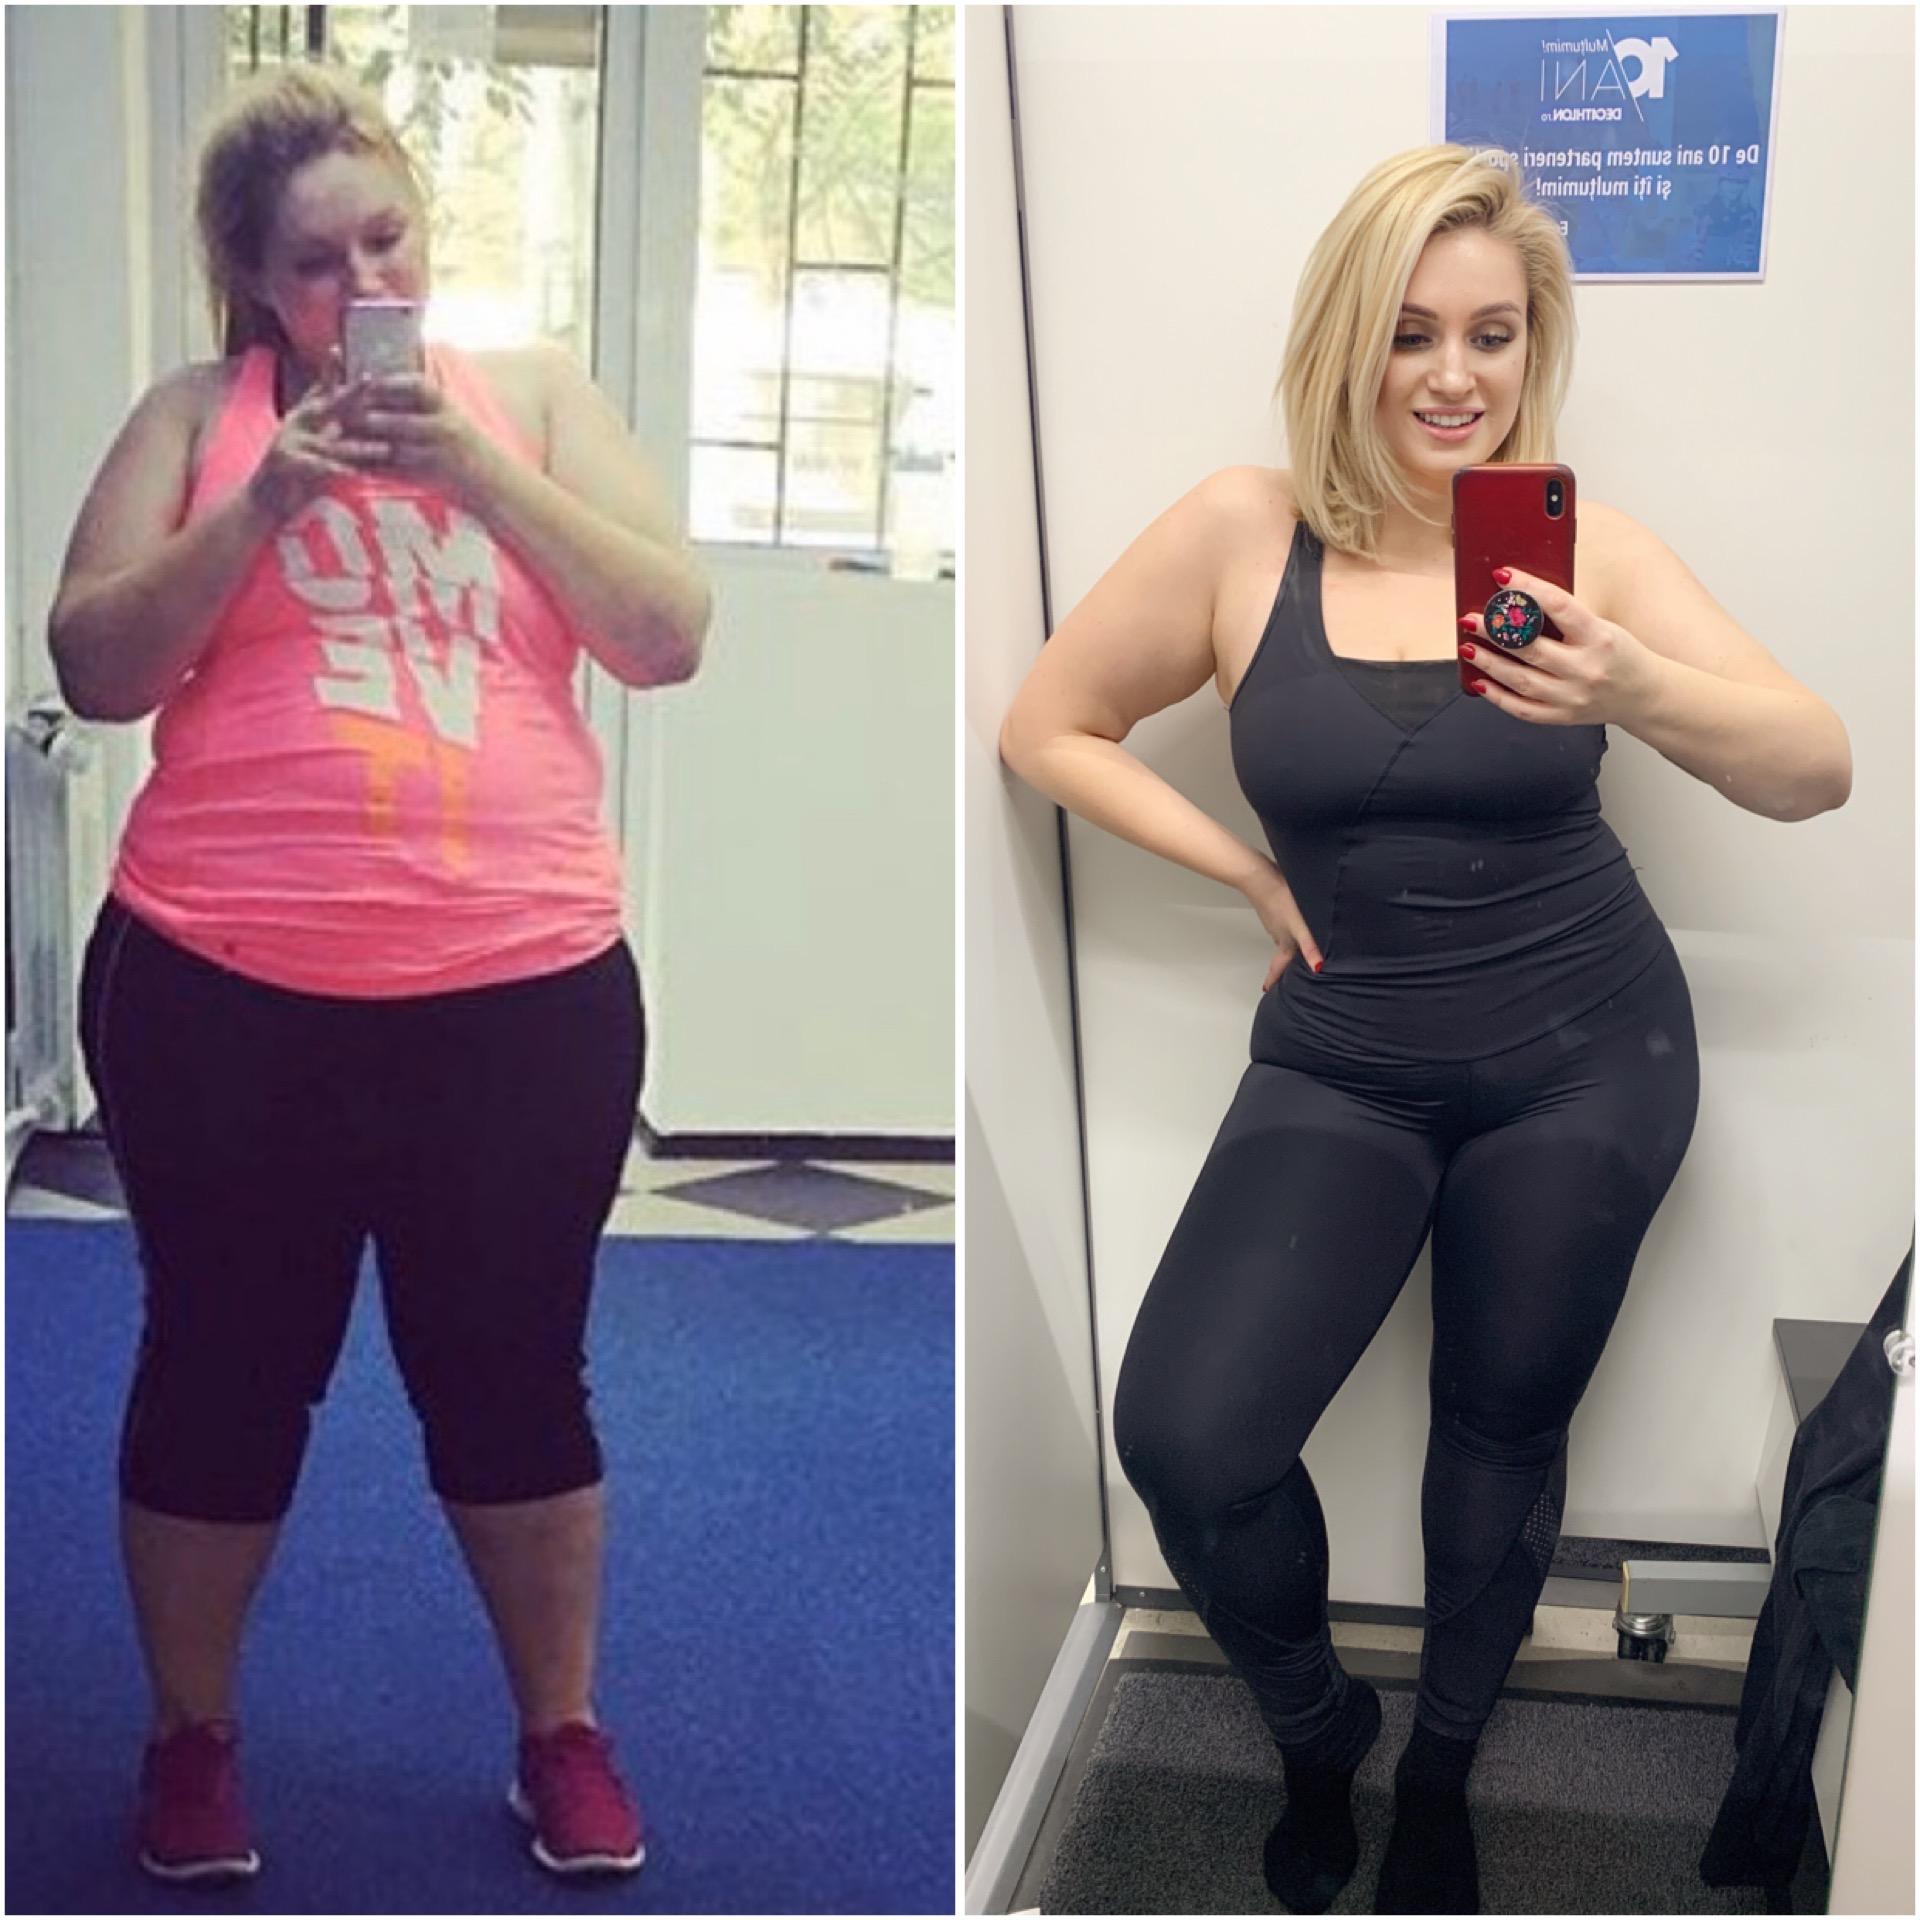 Categorie: Dieta & Fitness